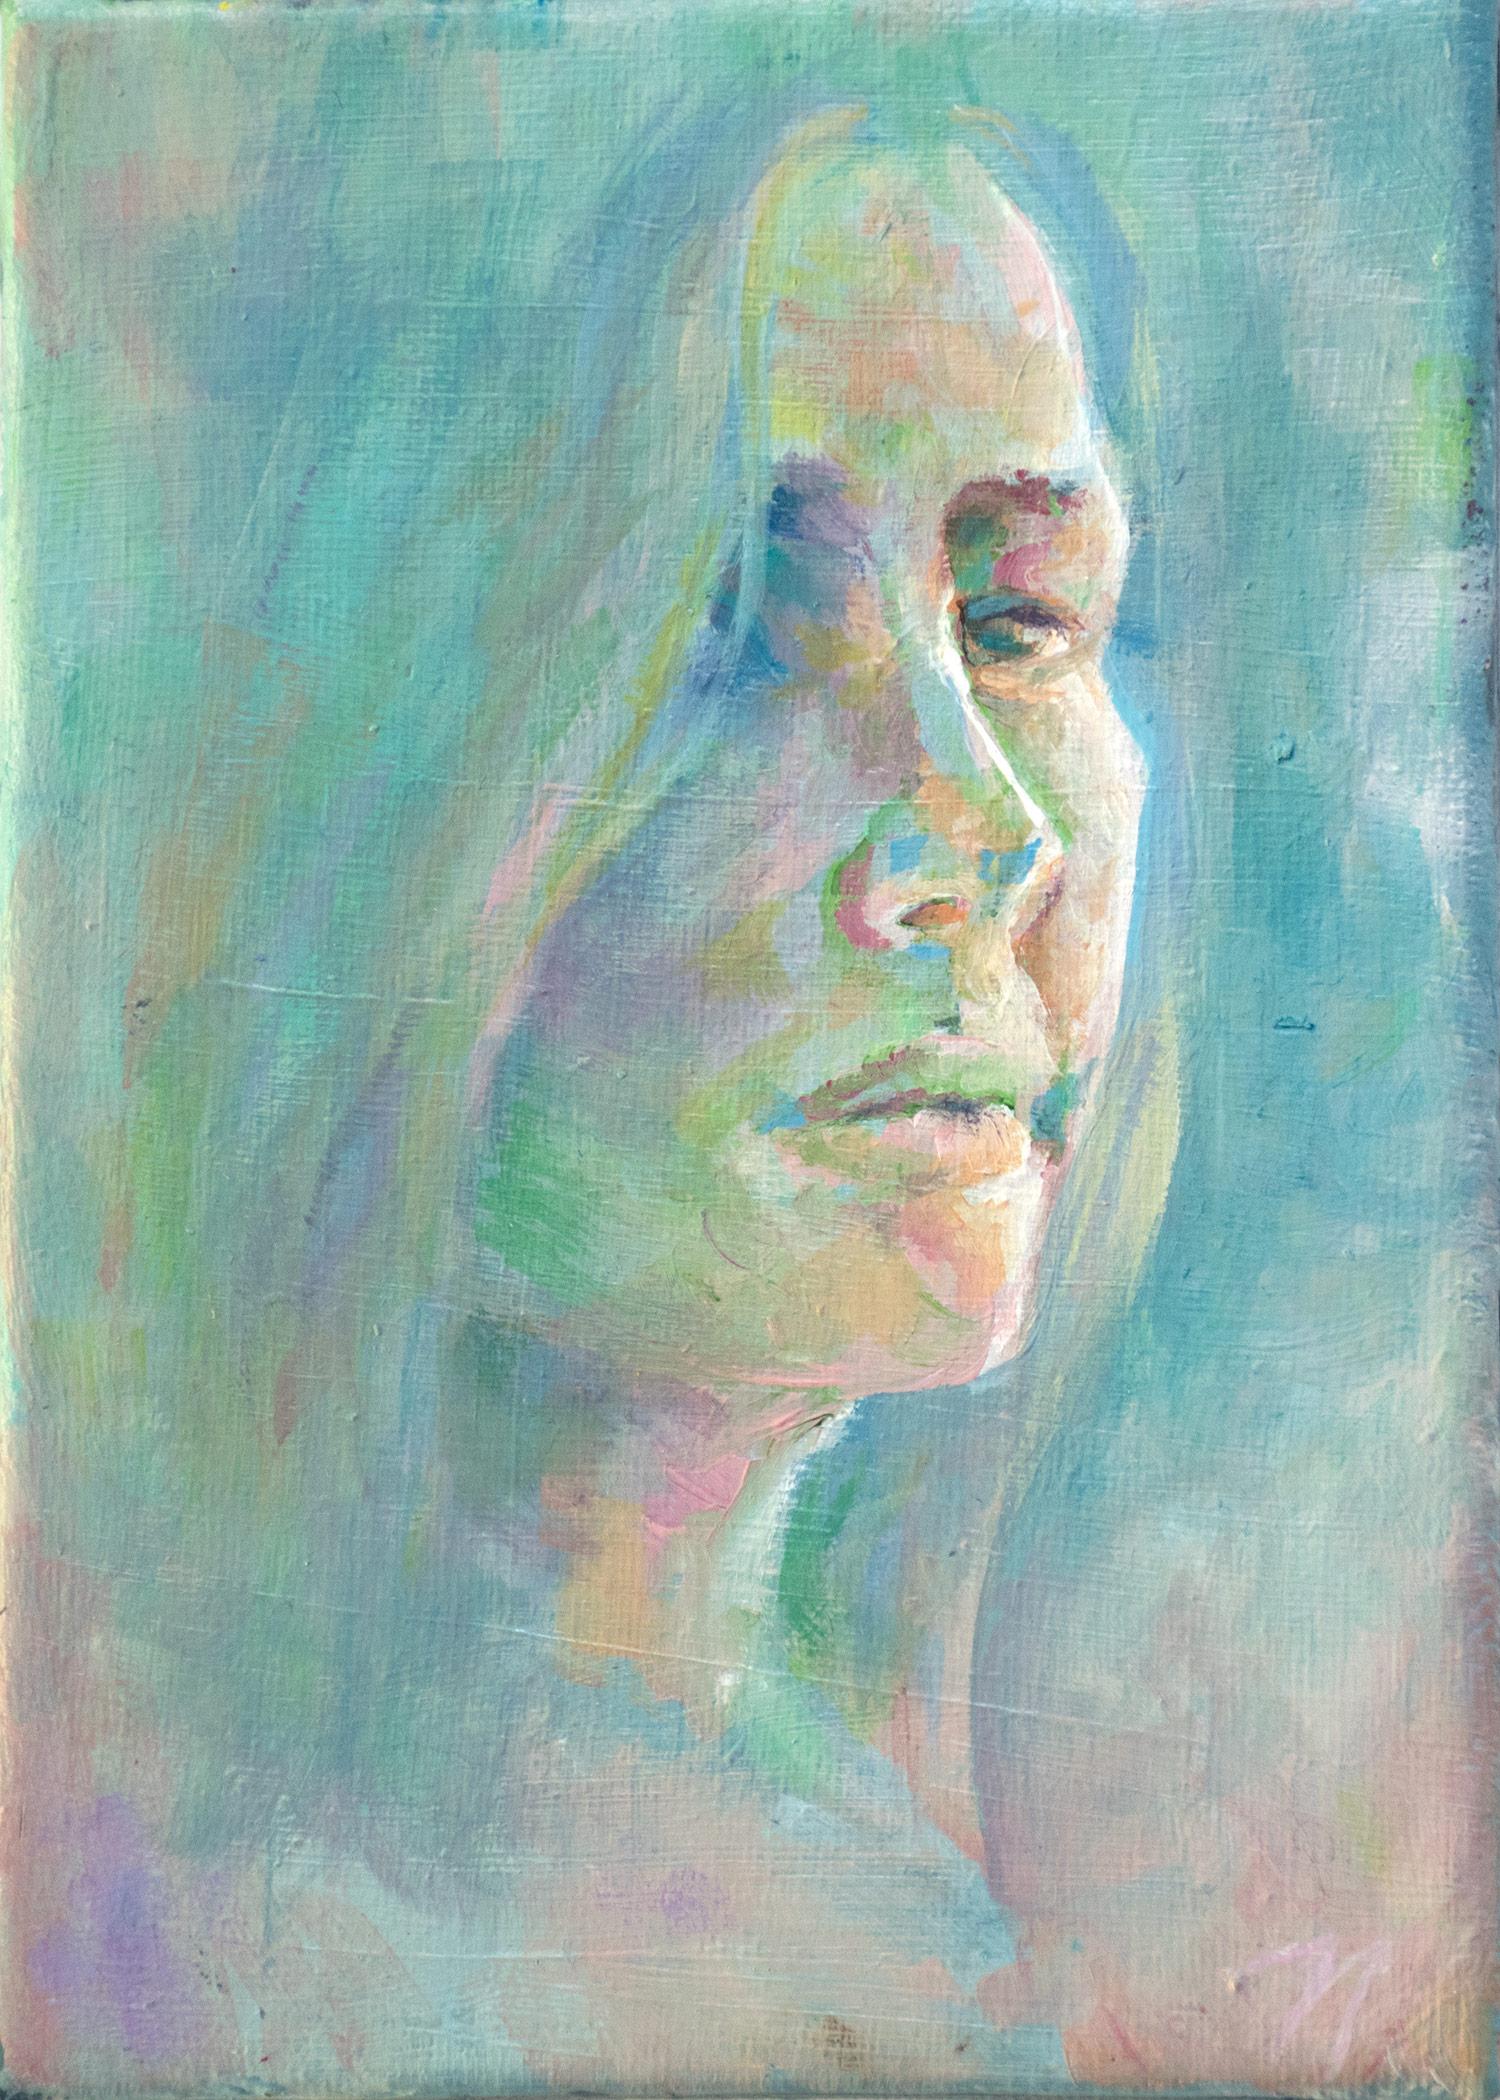 Soft Portrait by Nicole Shewchuk